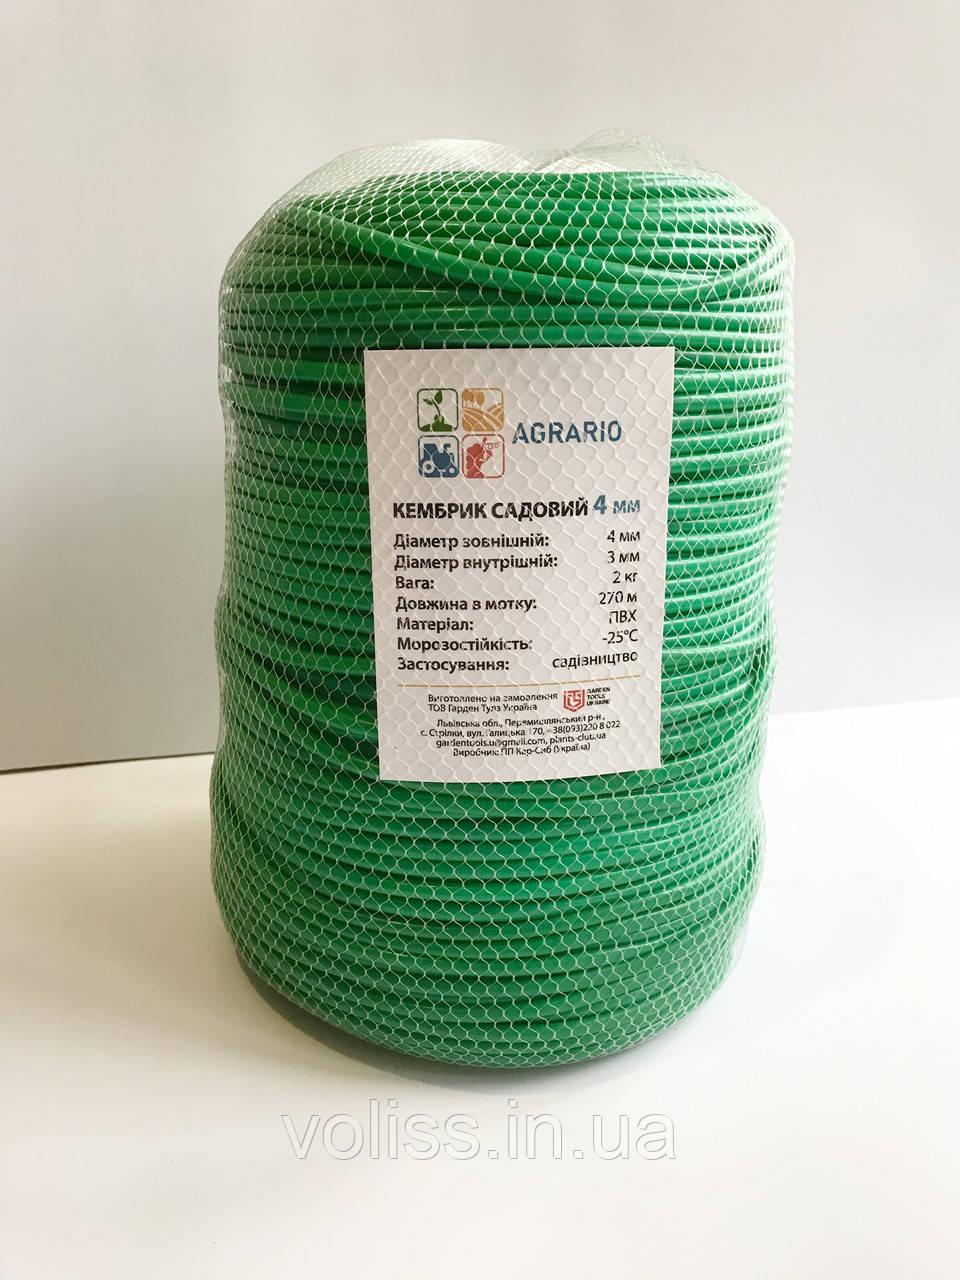 Кембрик - агрошнурок  4 *3 мм, , 2кг Аграрио (Agrario)